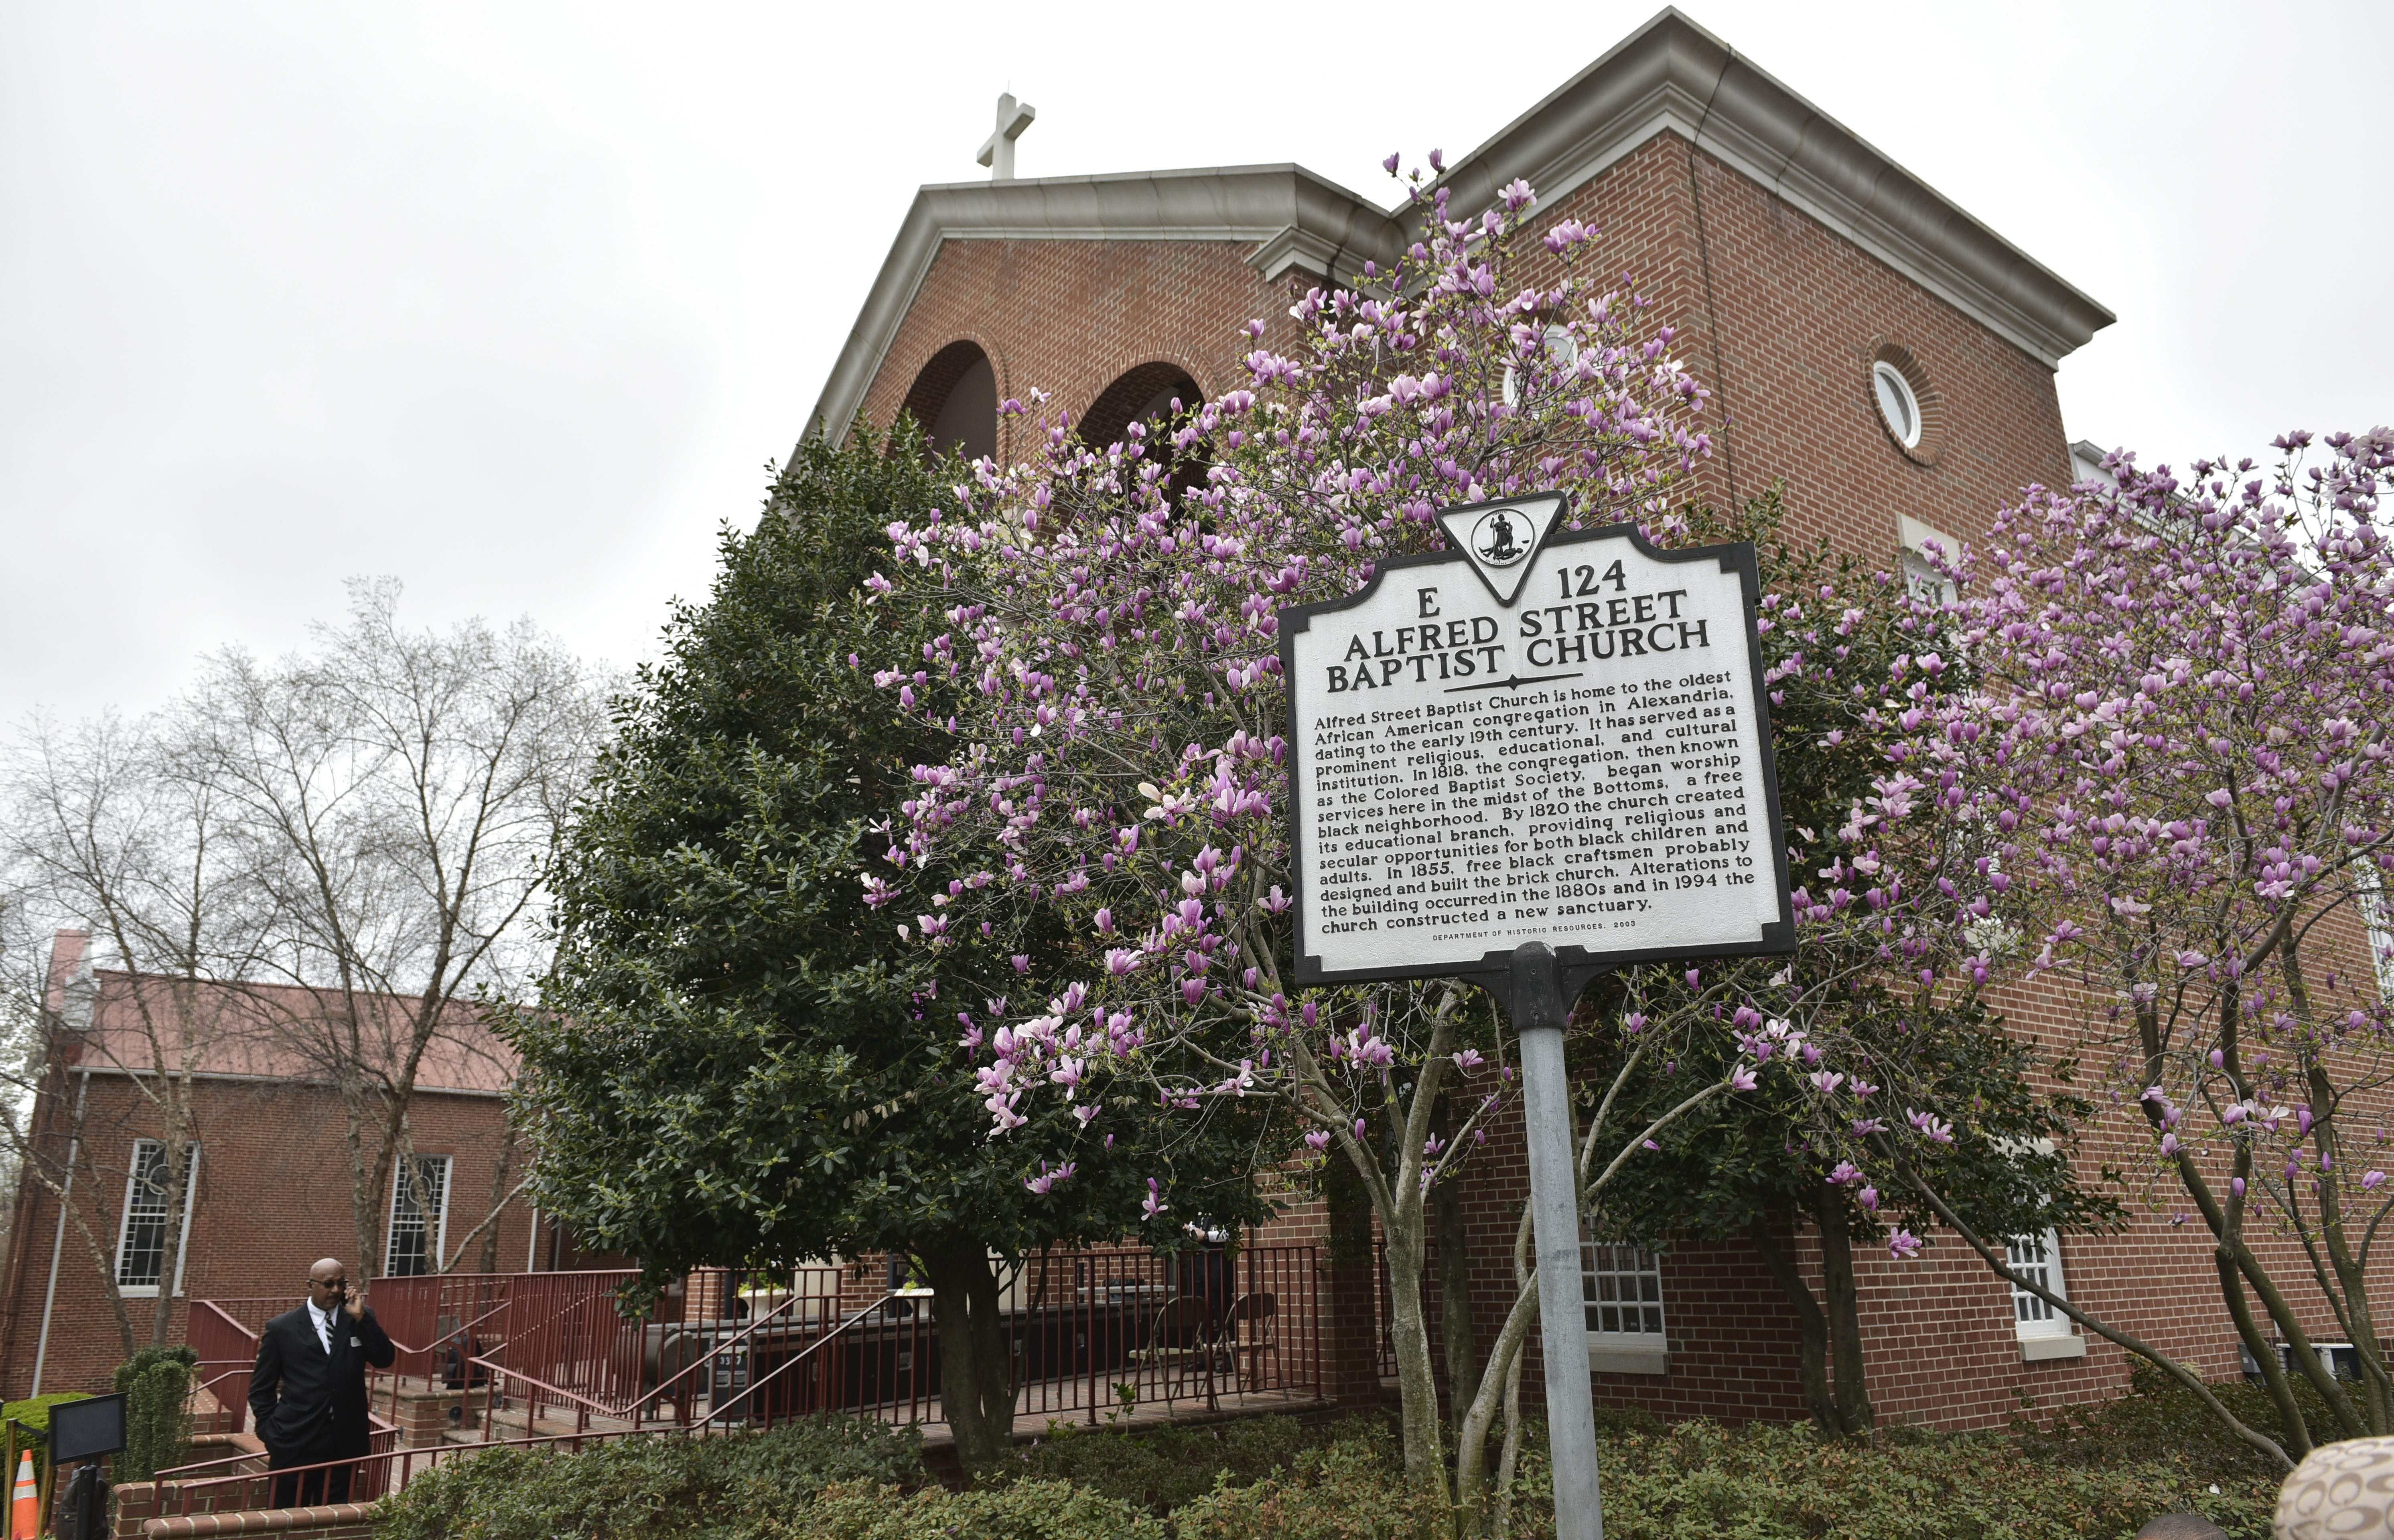 Alfred-street-baptist-church